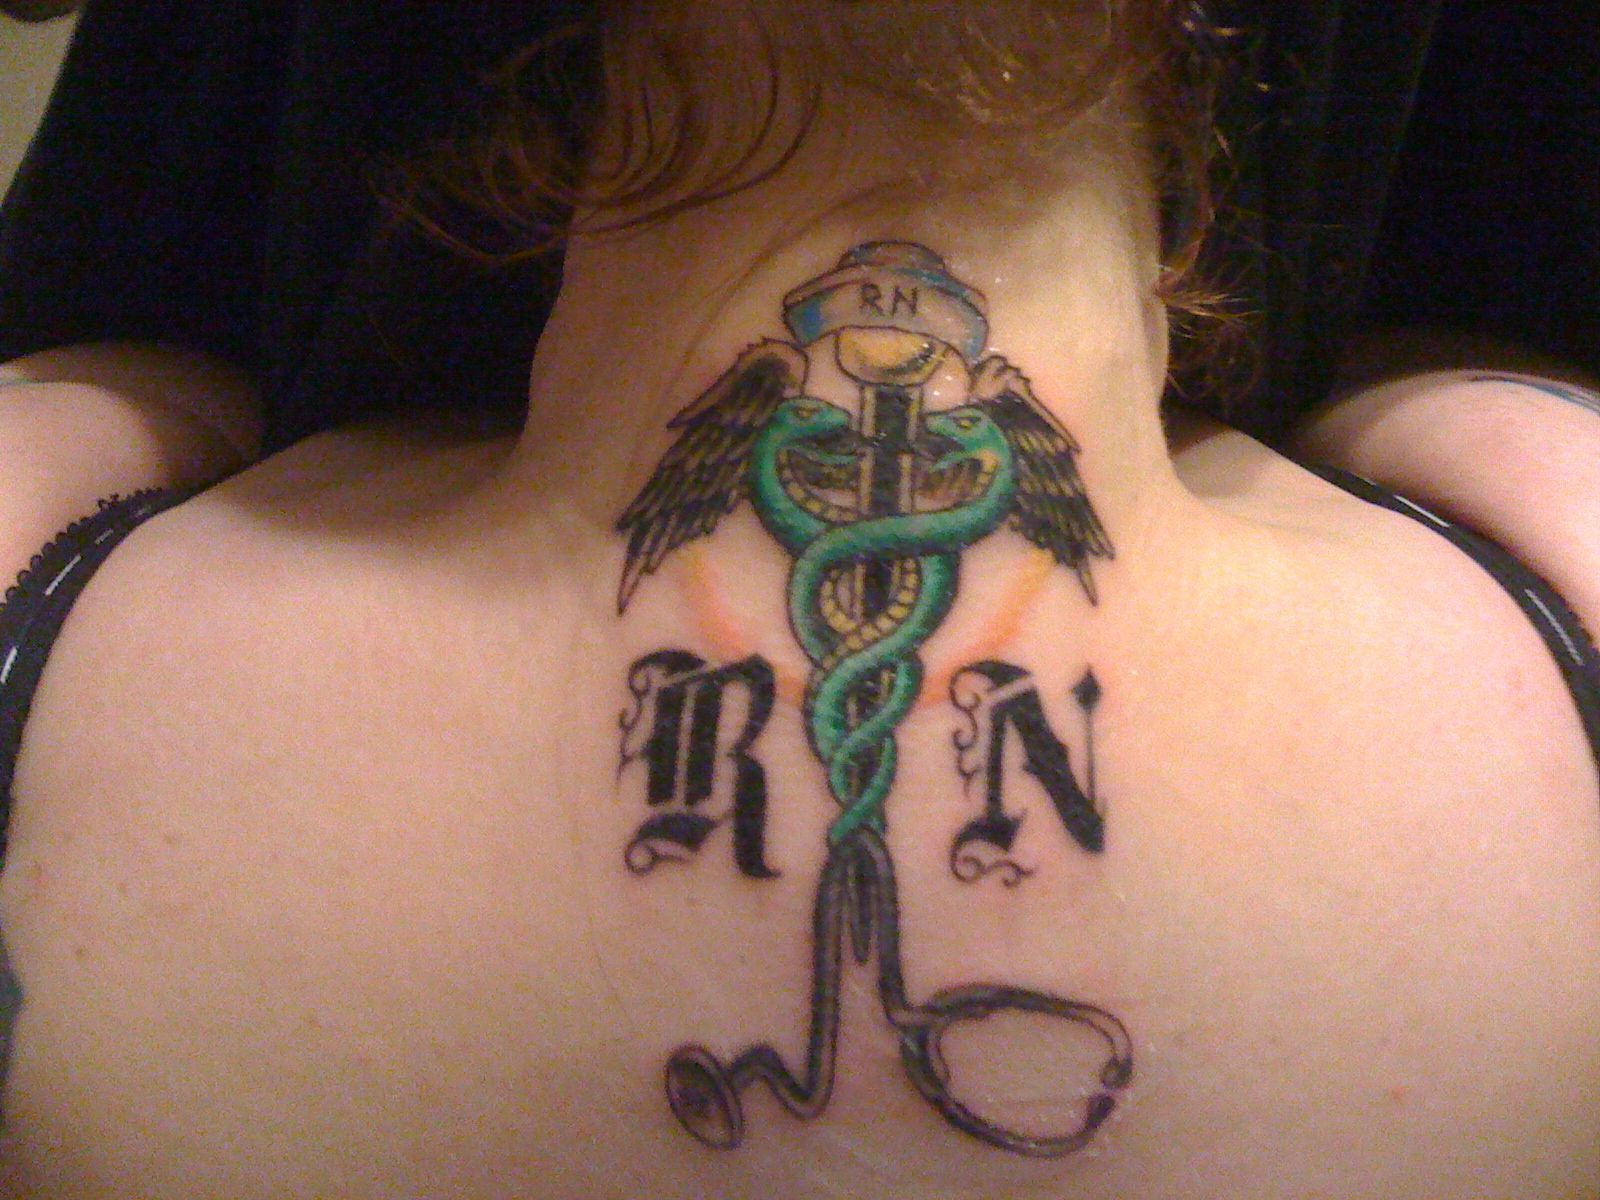 Tattoos tattoo ideas on pinterest rn - Piercings